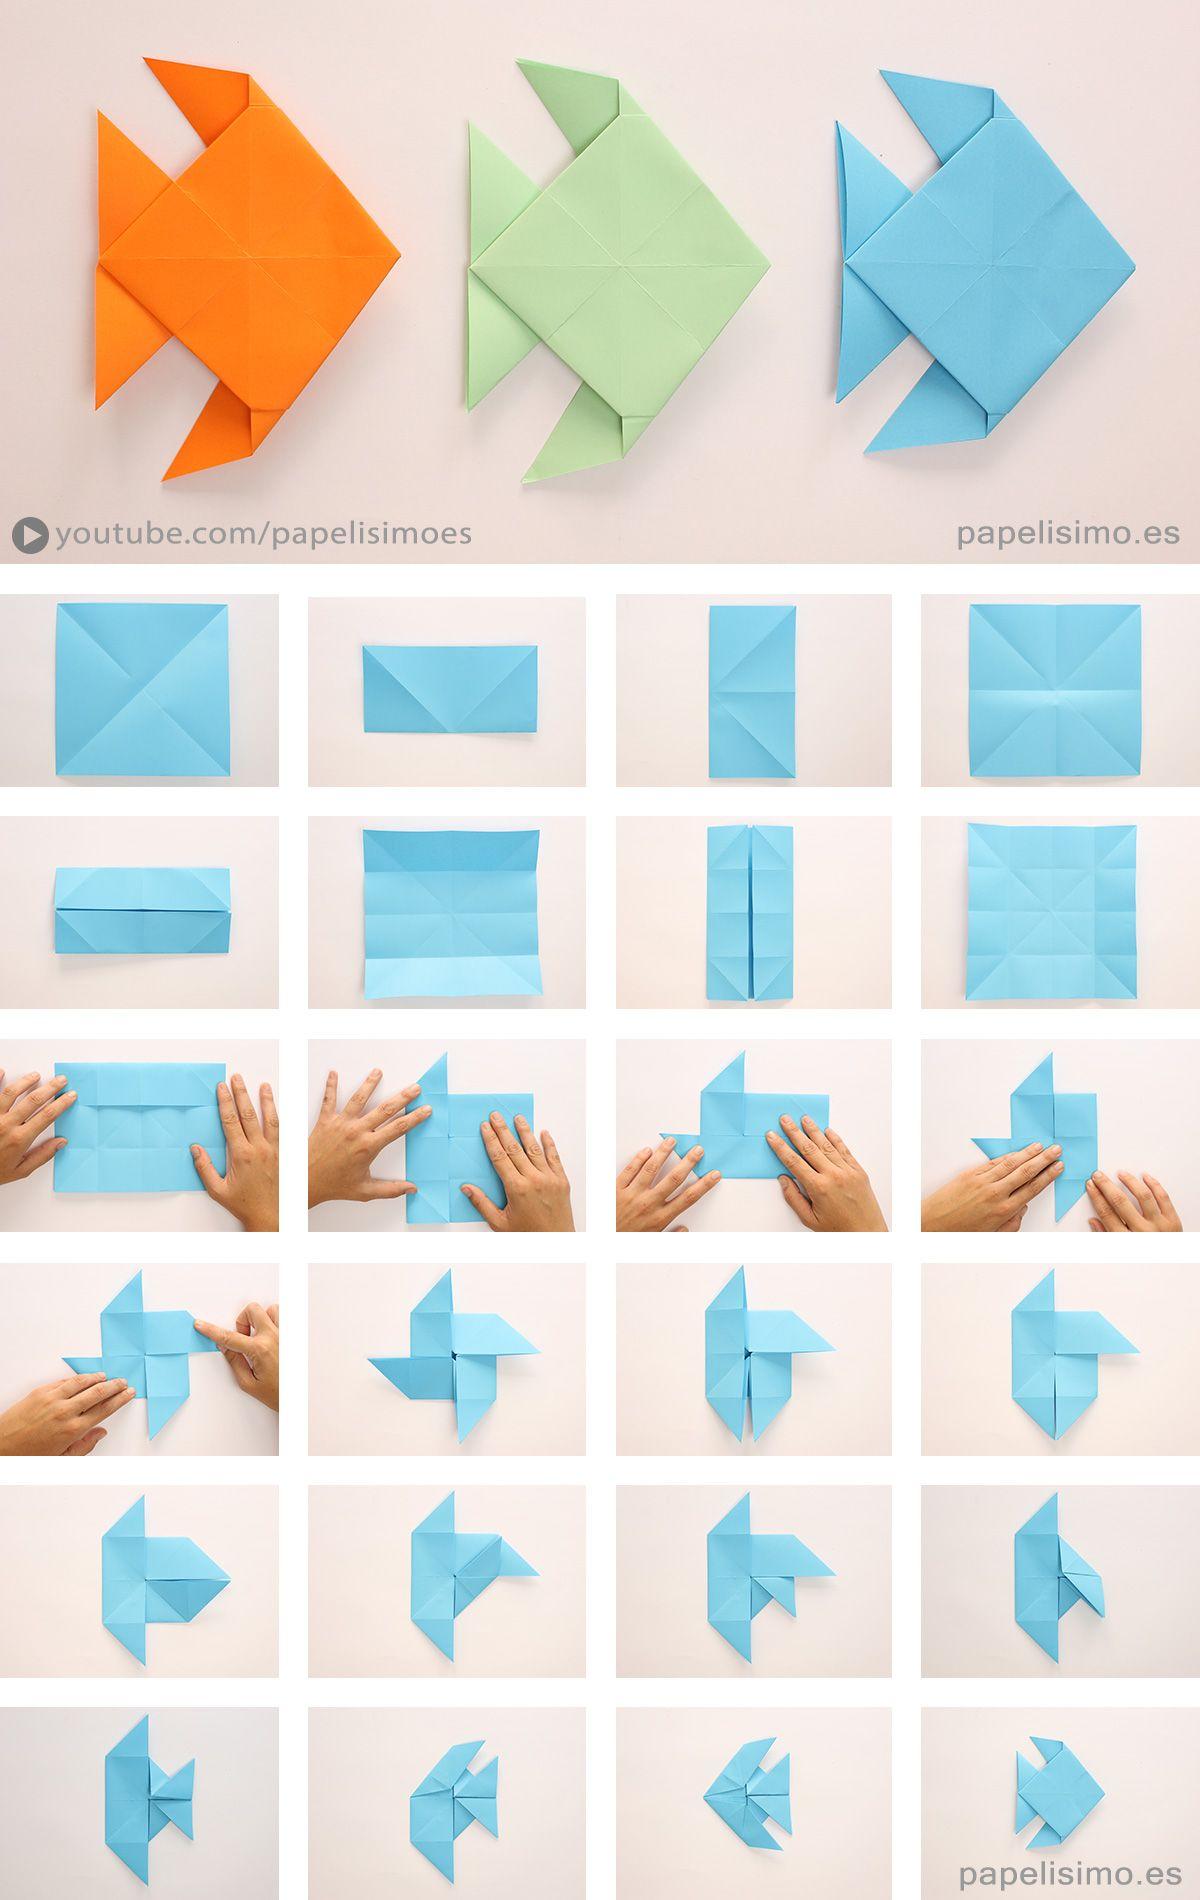 pez-de-papel-papiroflexia-origami-paper-fish | Papelisimo ... - photo#9